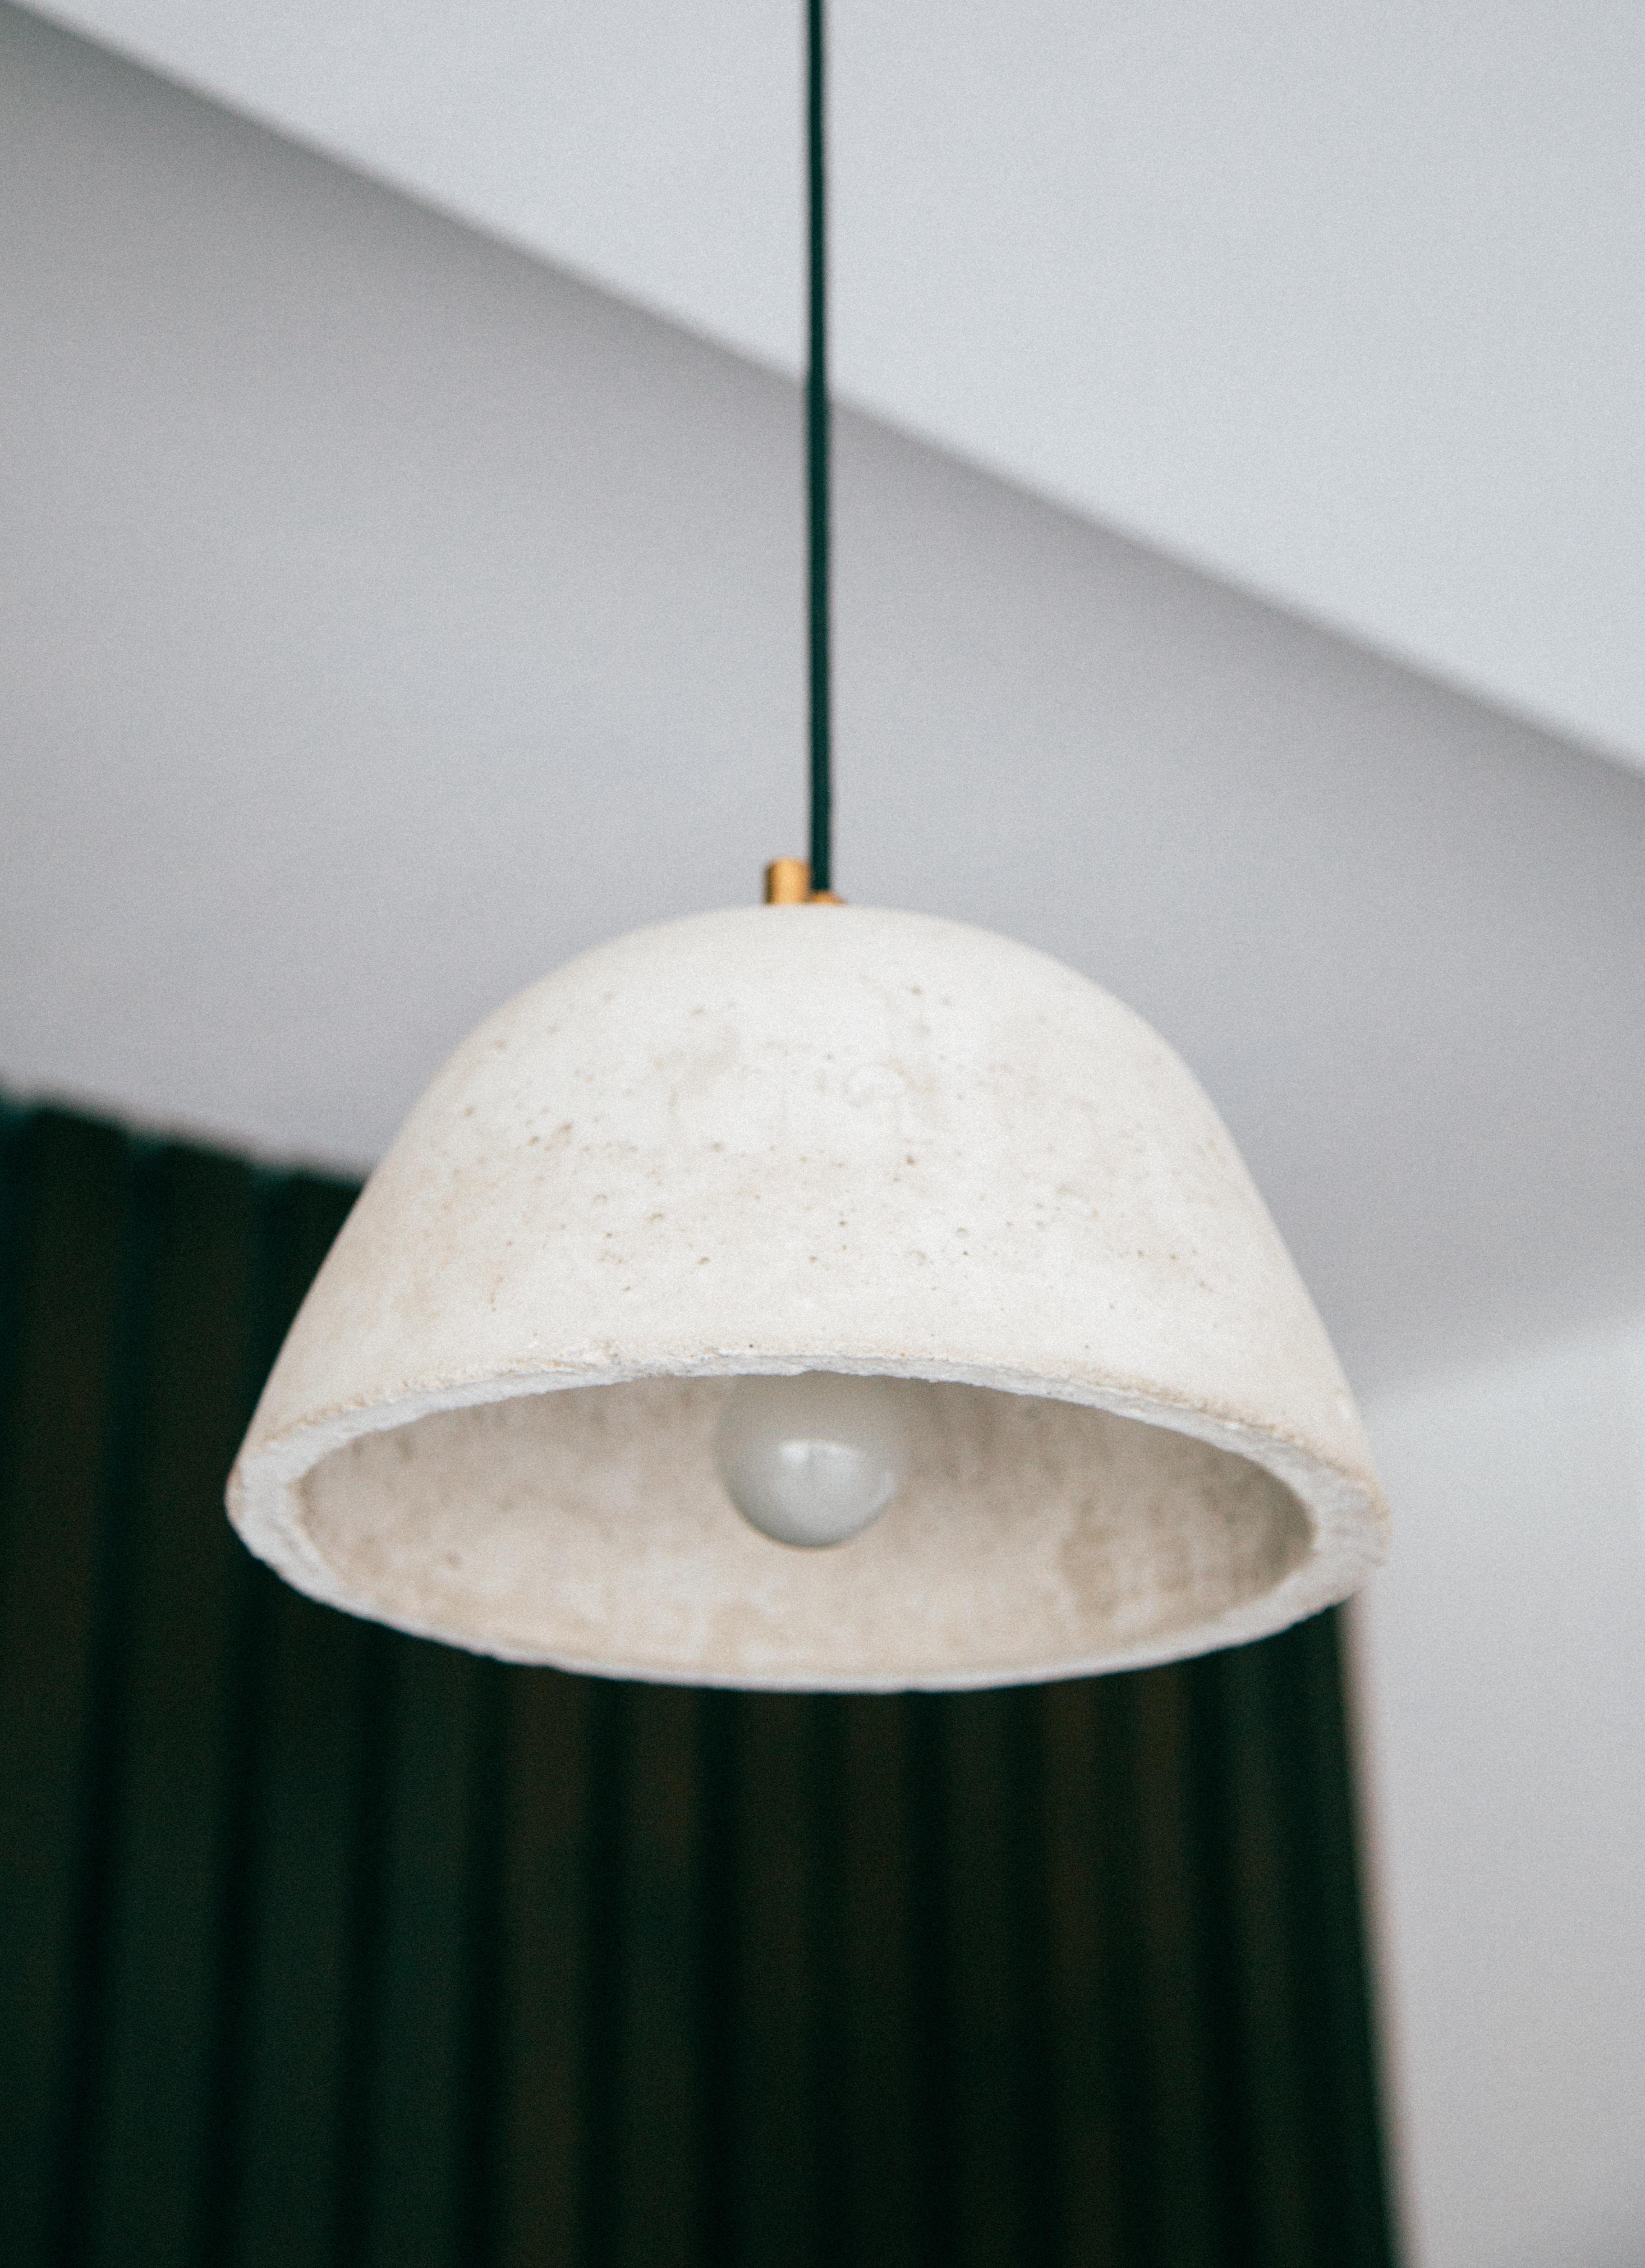 Montaż lamp